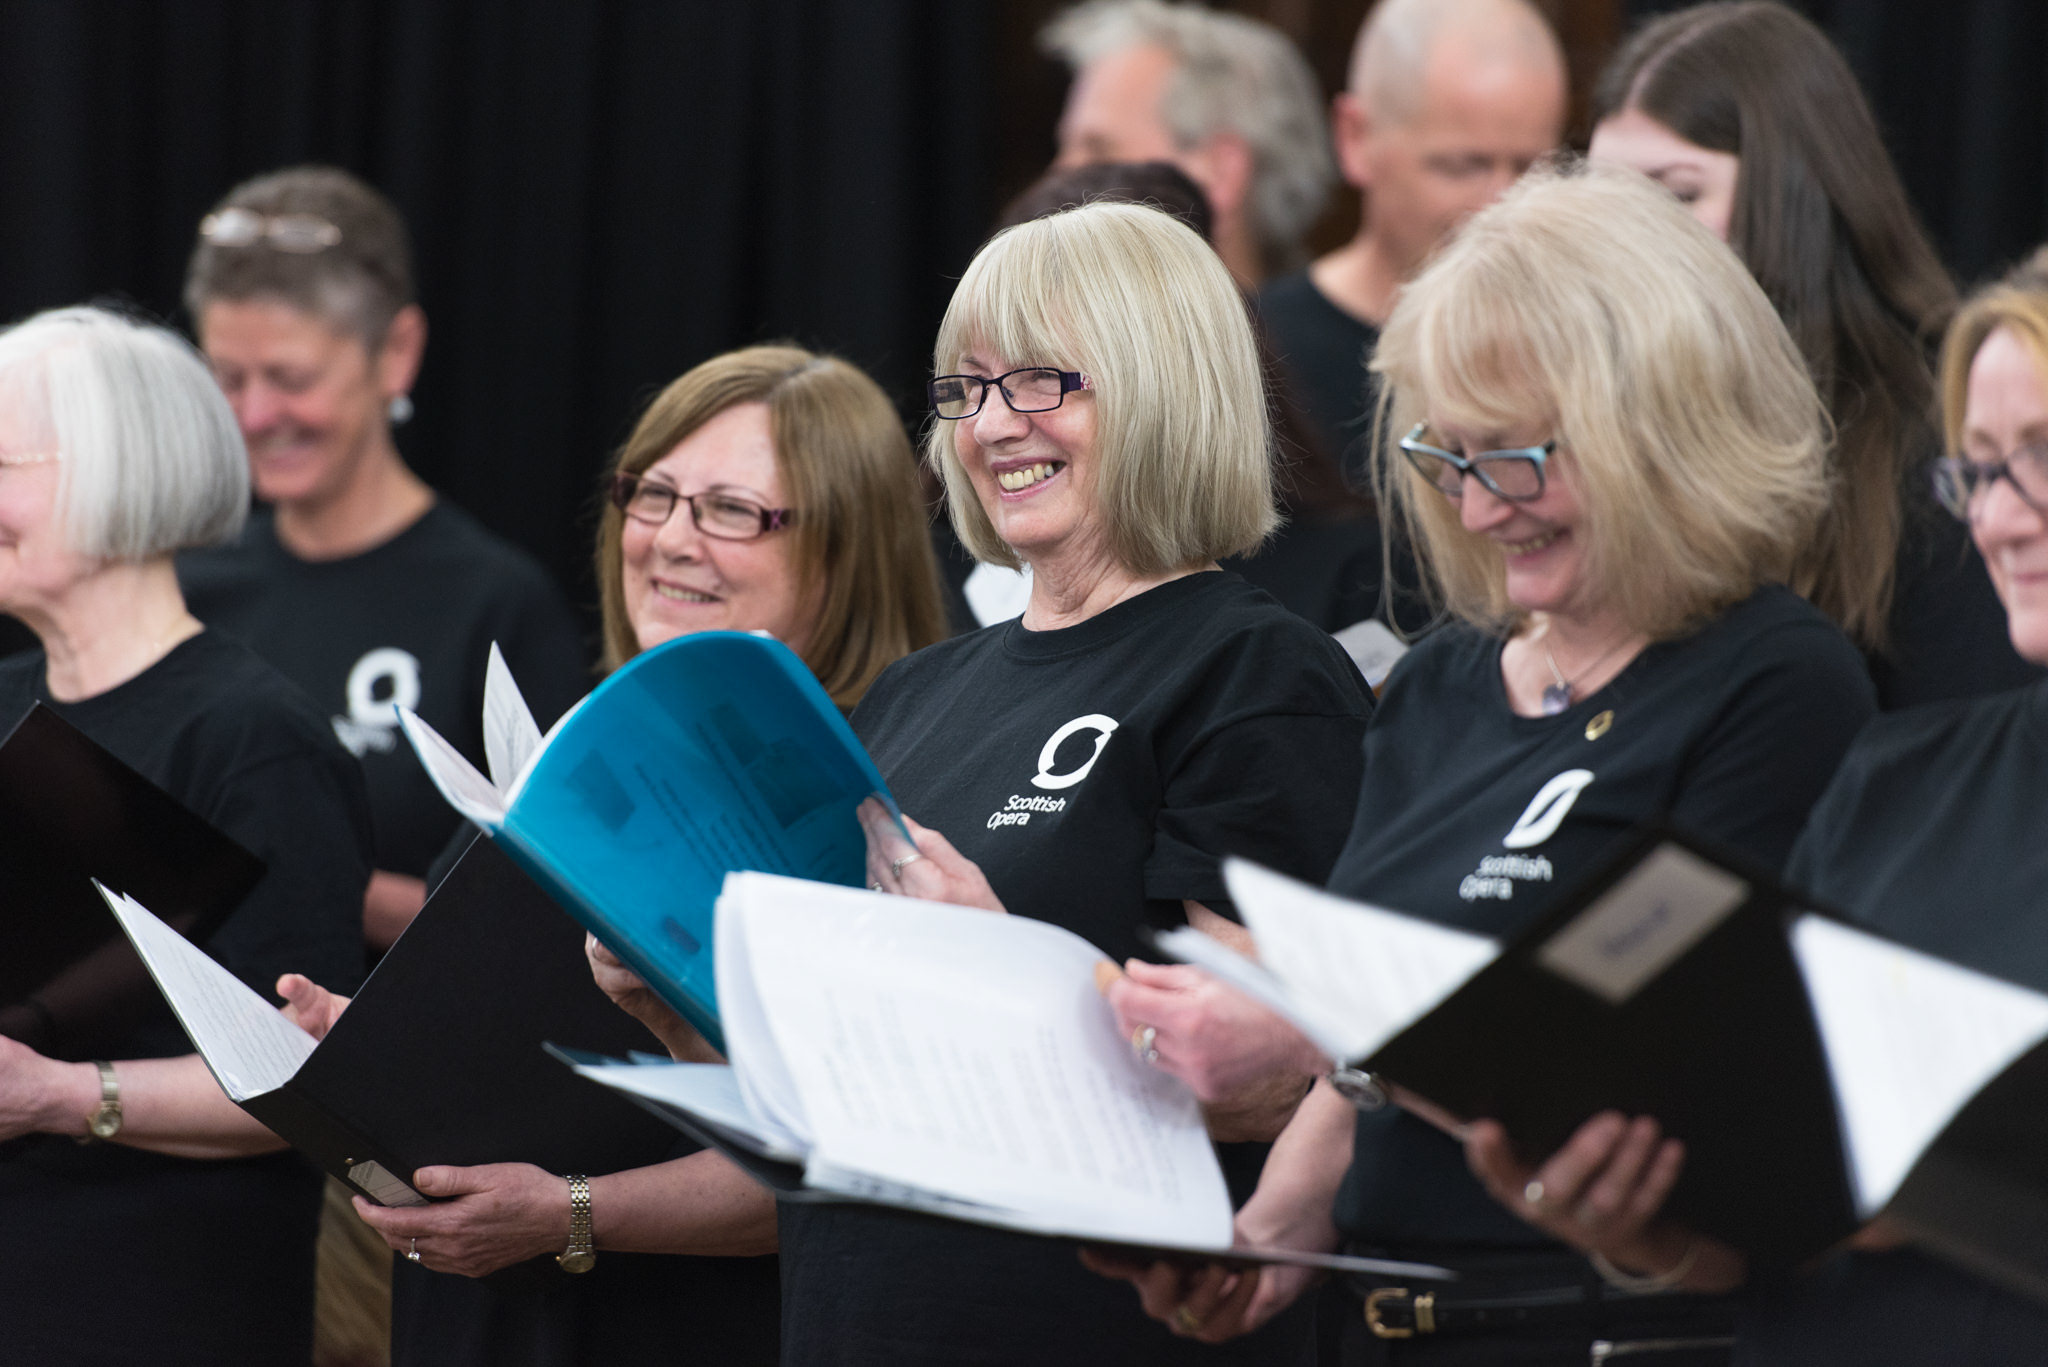 scottish-opera-community-choir-performers-glasgow.jpg